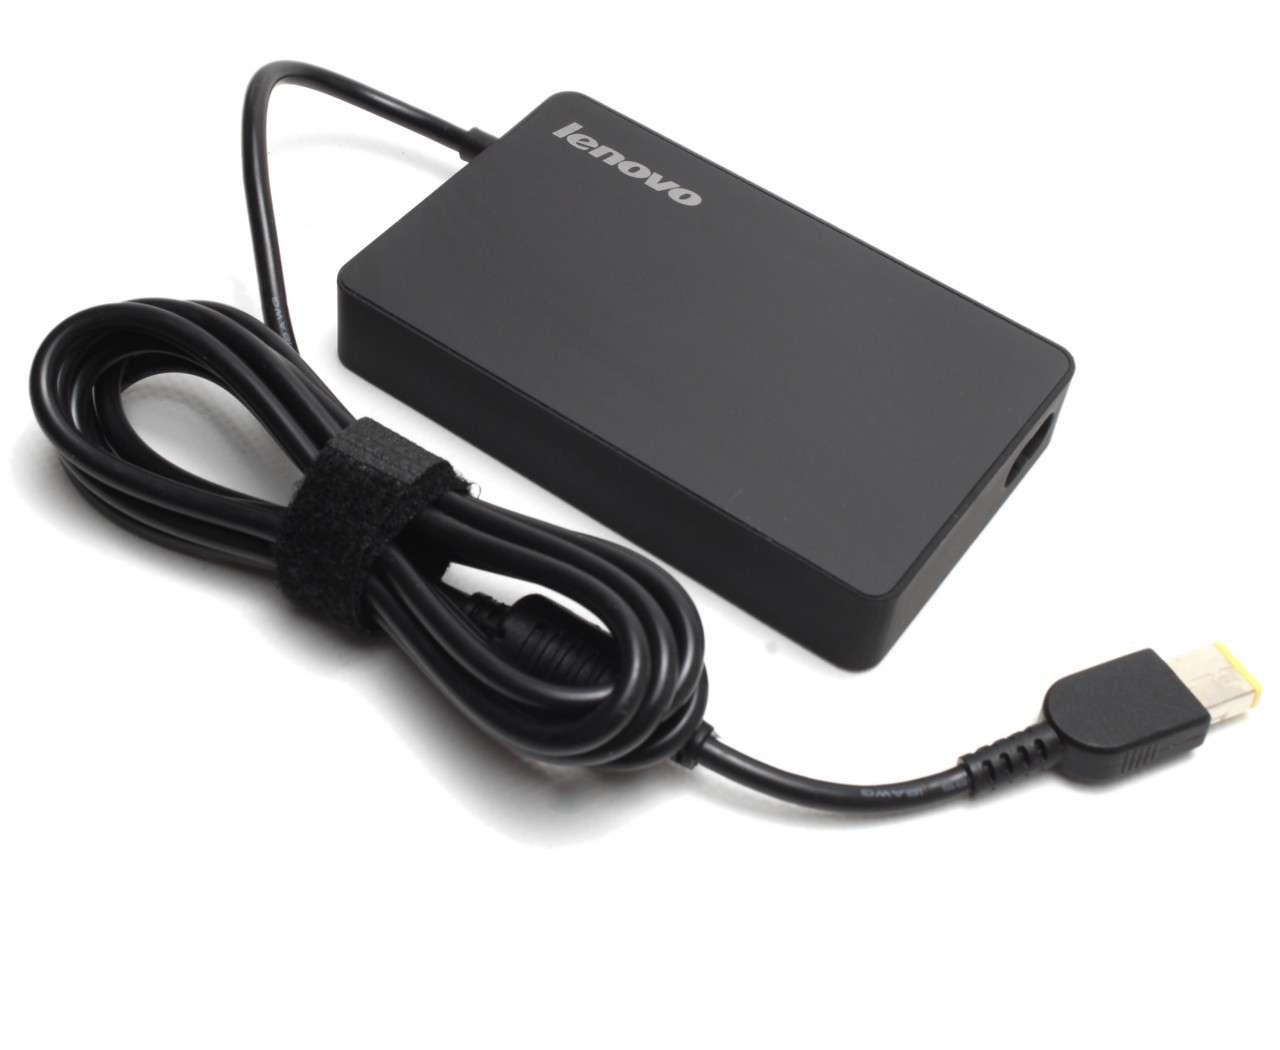 Incarcator Lenovo ThinkPad L540 65W Slim Version imagine